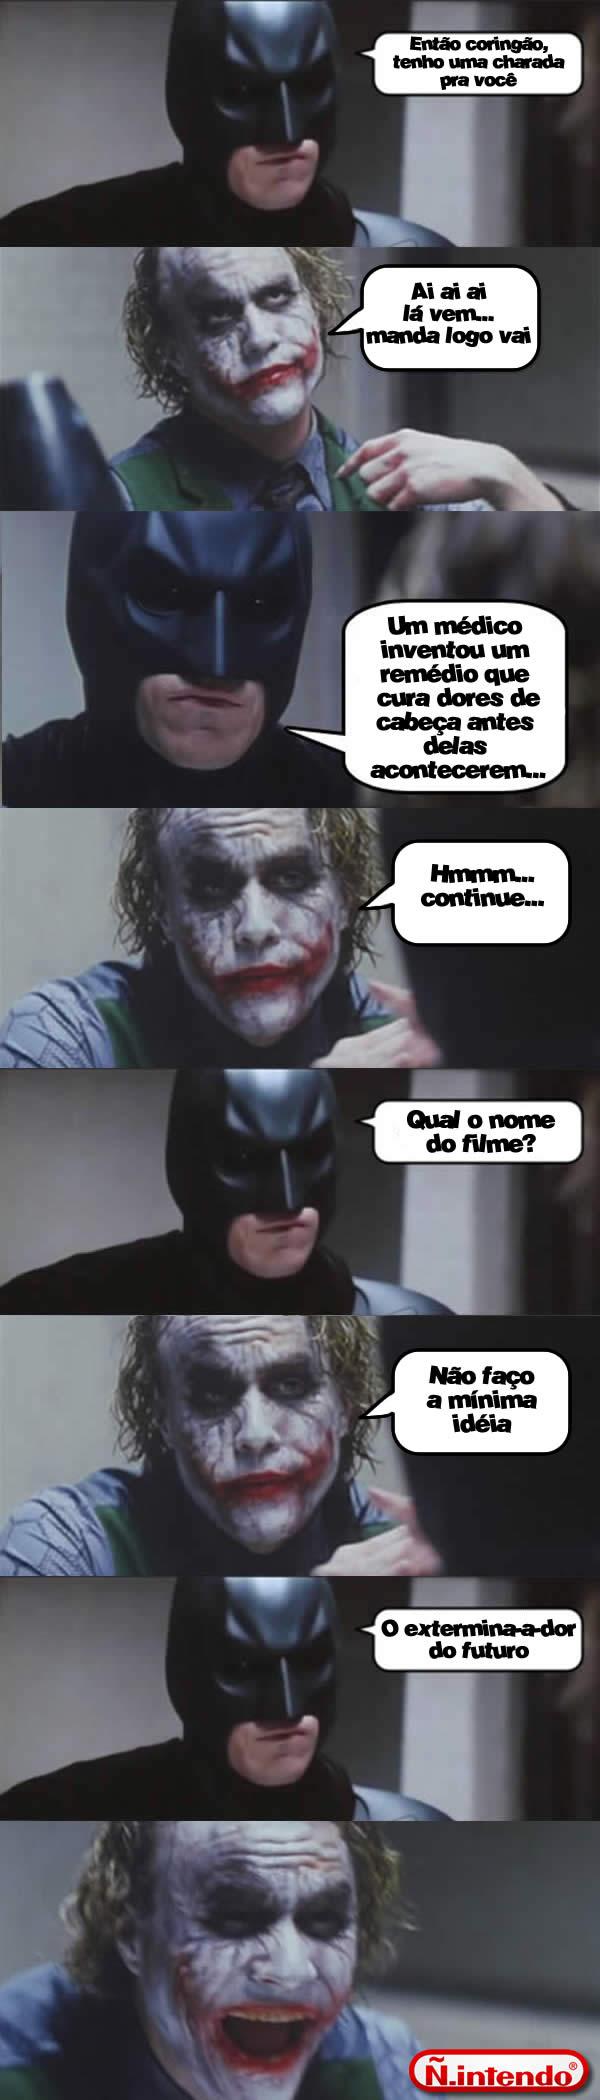 Batfilme